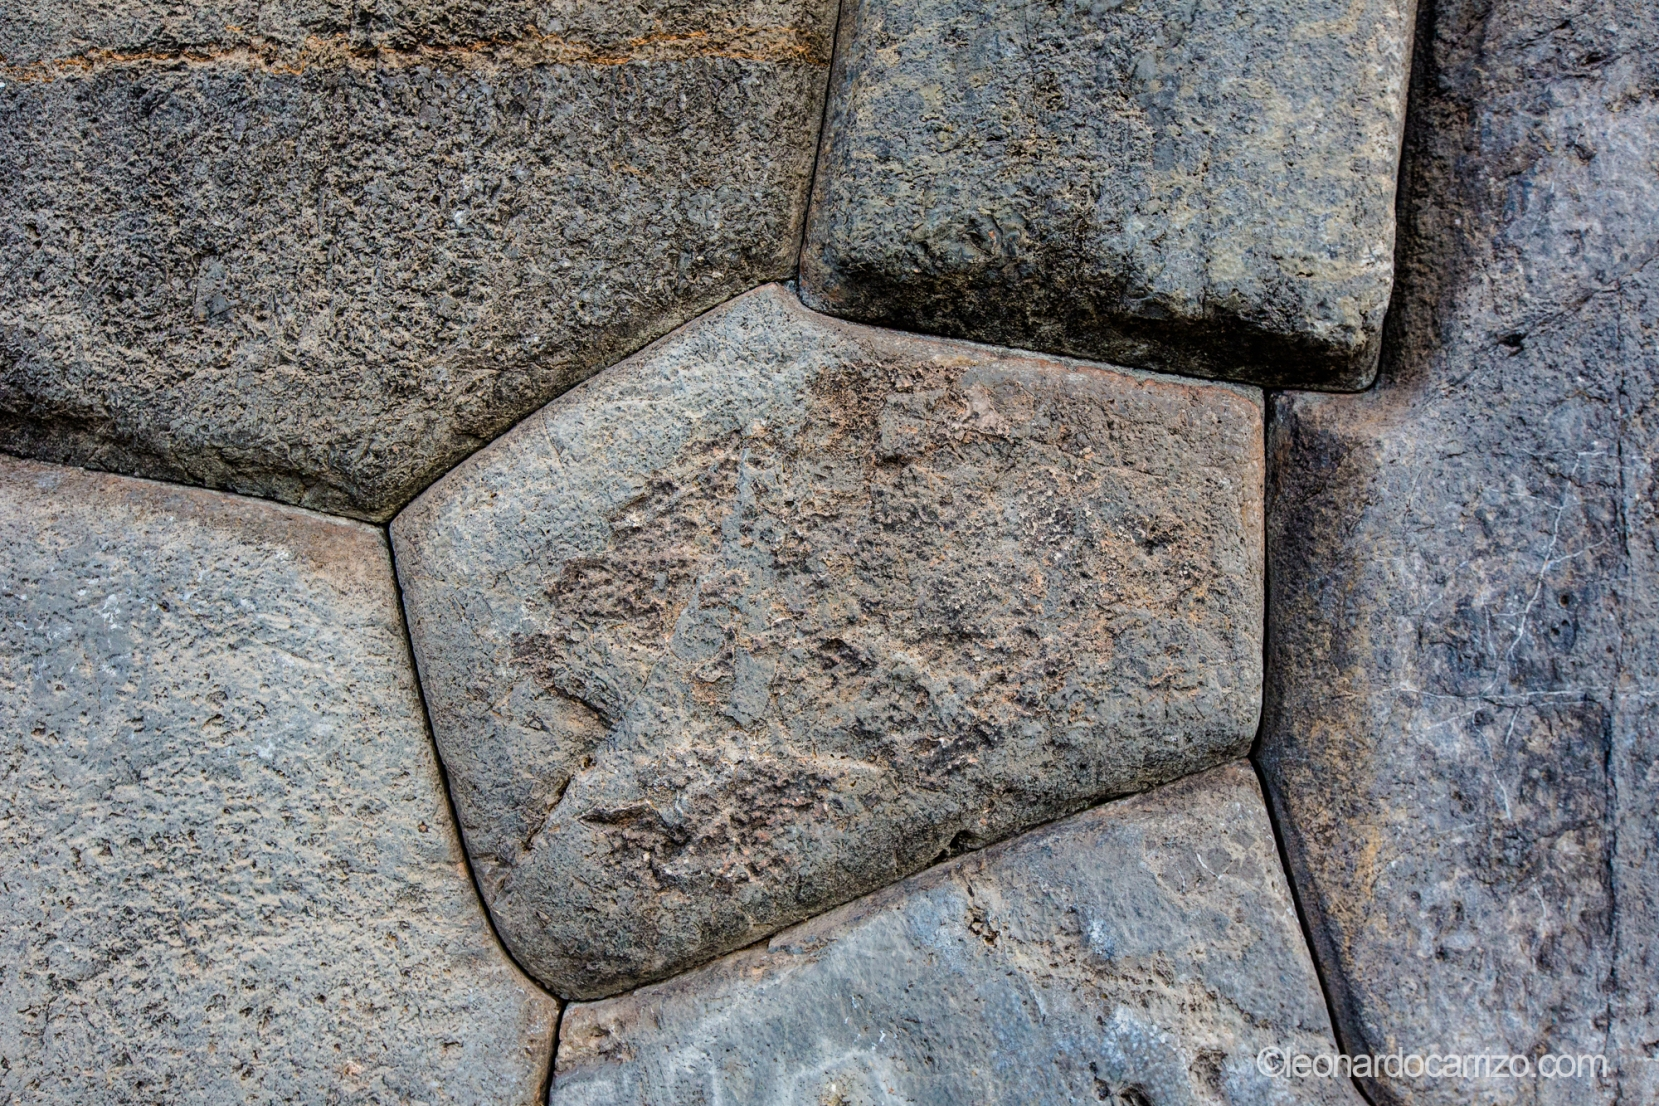 Sacsayhuaman archiological site, Cusco, Peru (photo by Leonardo Carrizo)